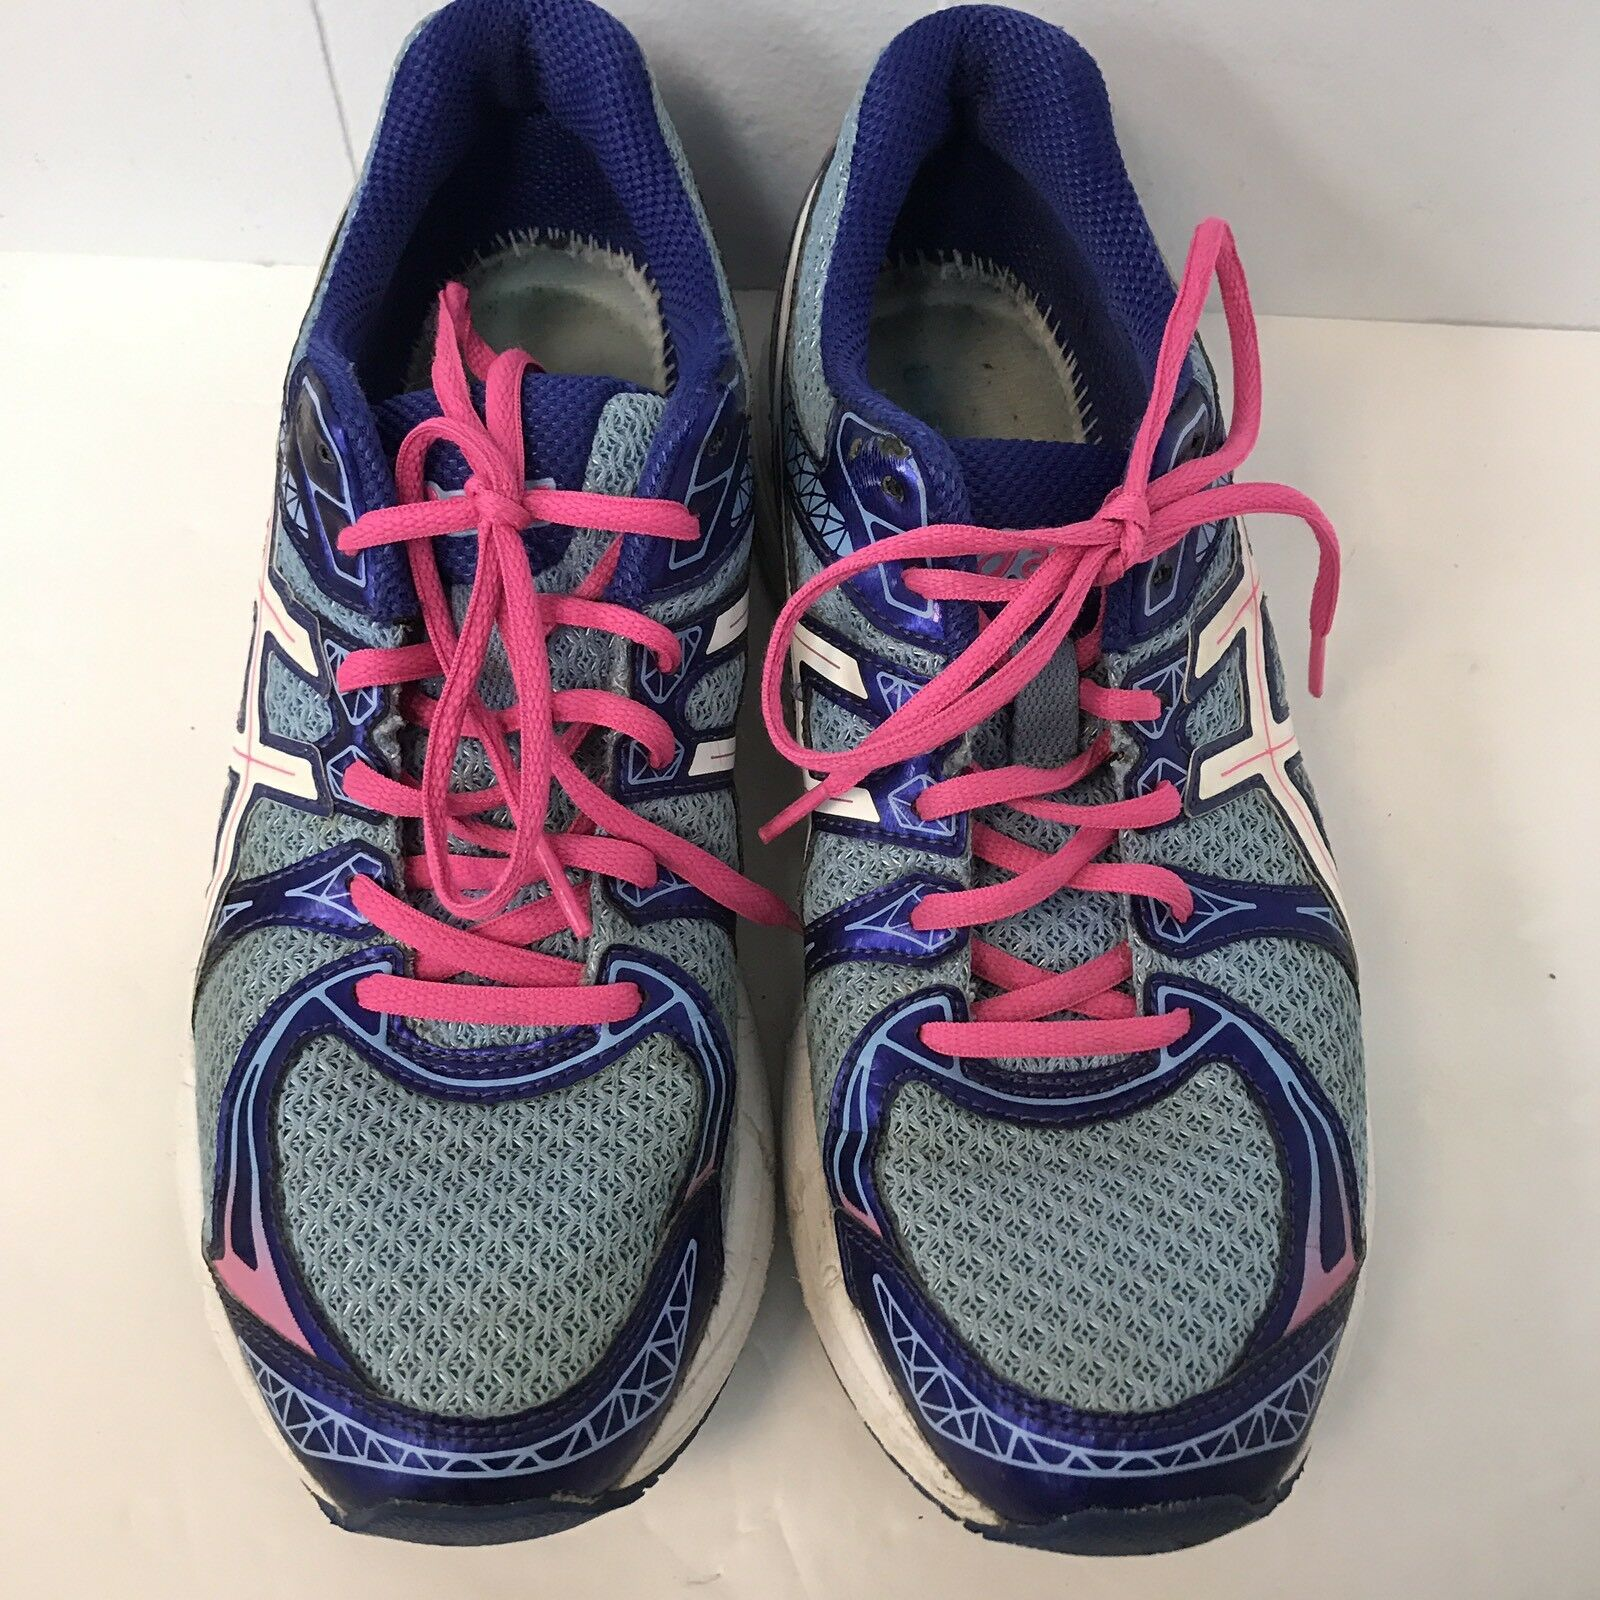 Asics Gel Women Exalt 2 Running Shoes Women Gel Size 10 f7f335